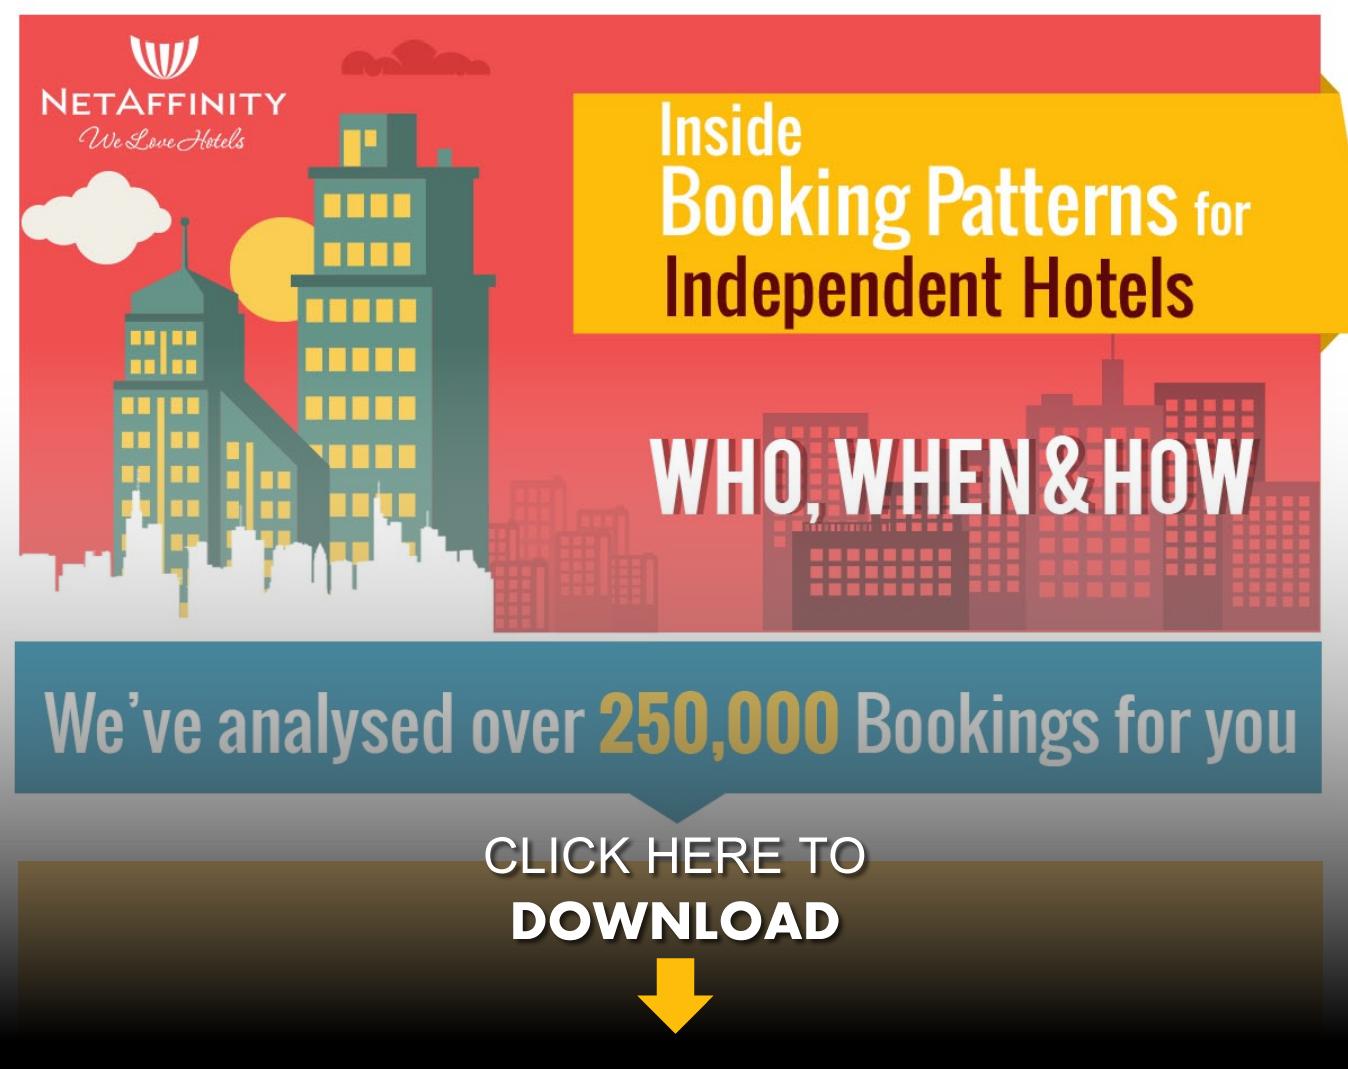 booking-patterns-download-image.png